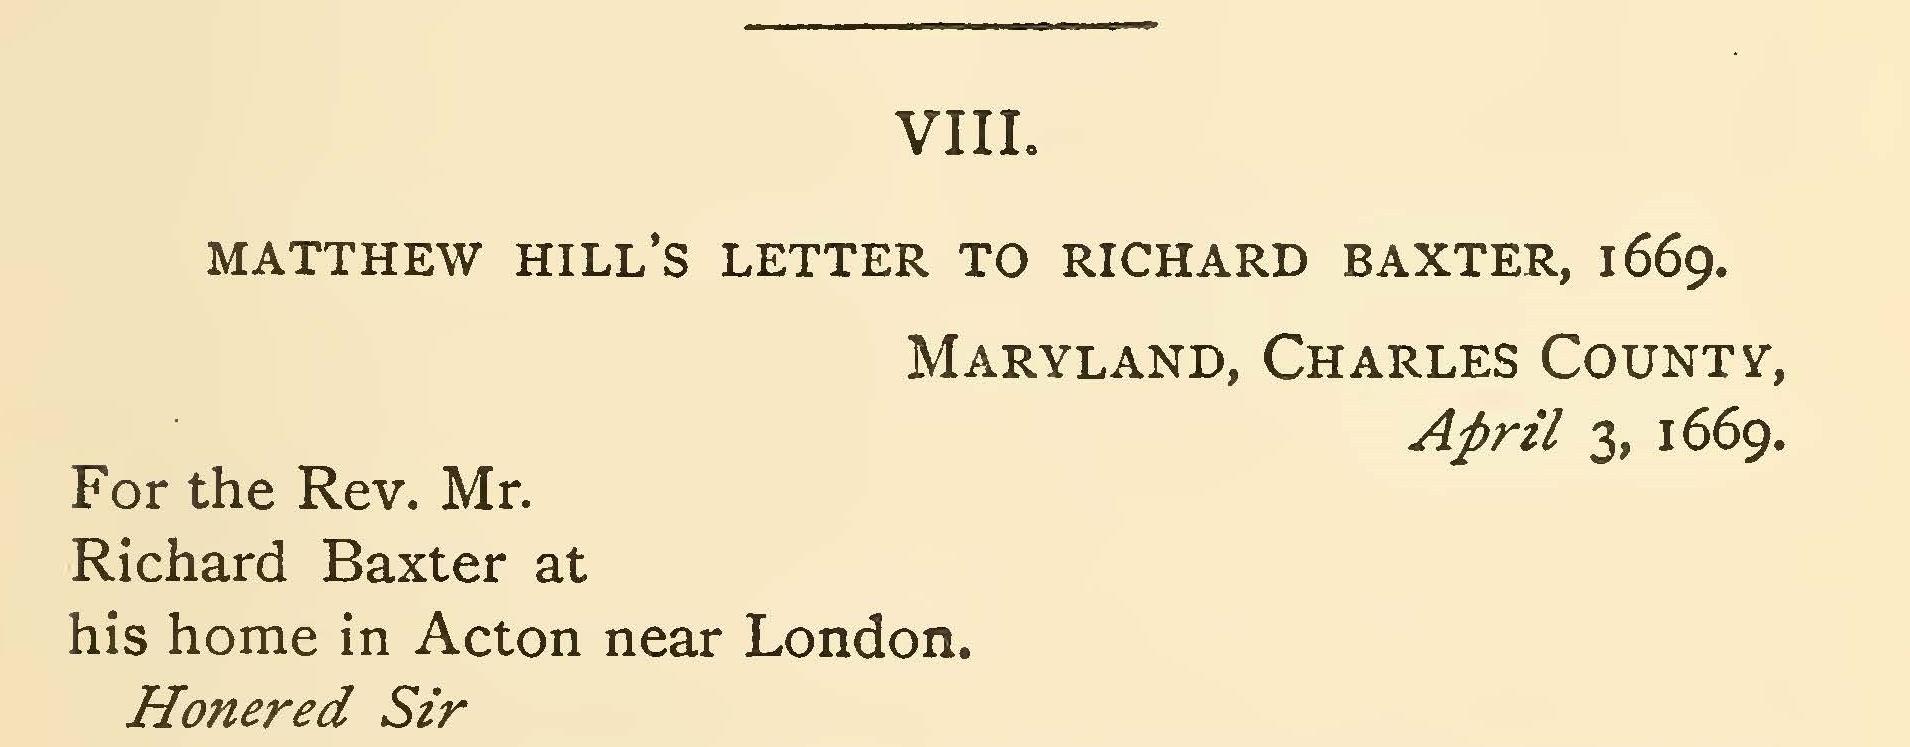 Hill, Matthew, Letter to Richard Baxter Title Page.jpg